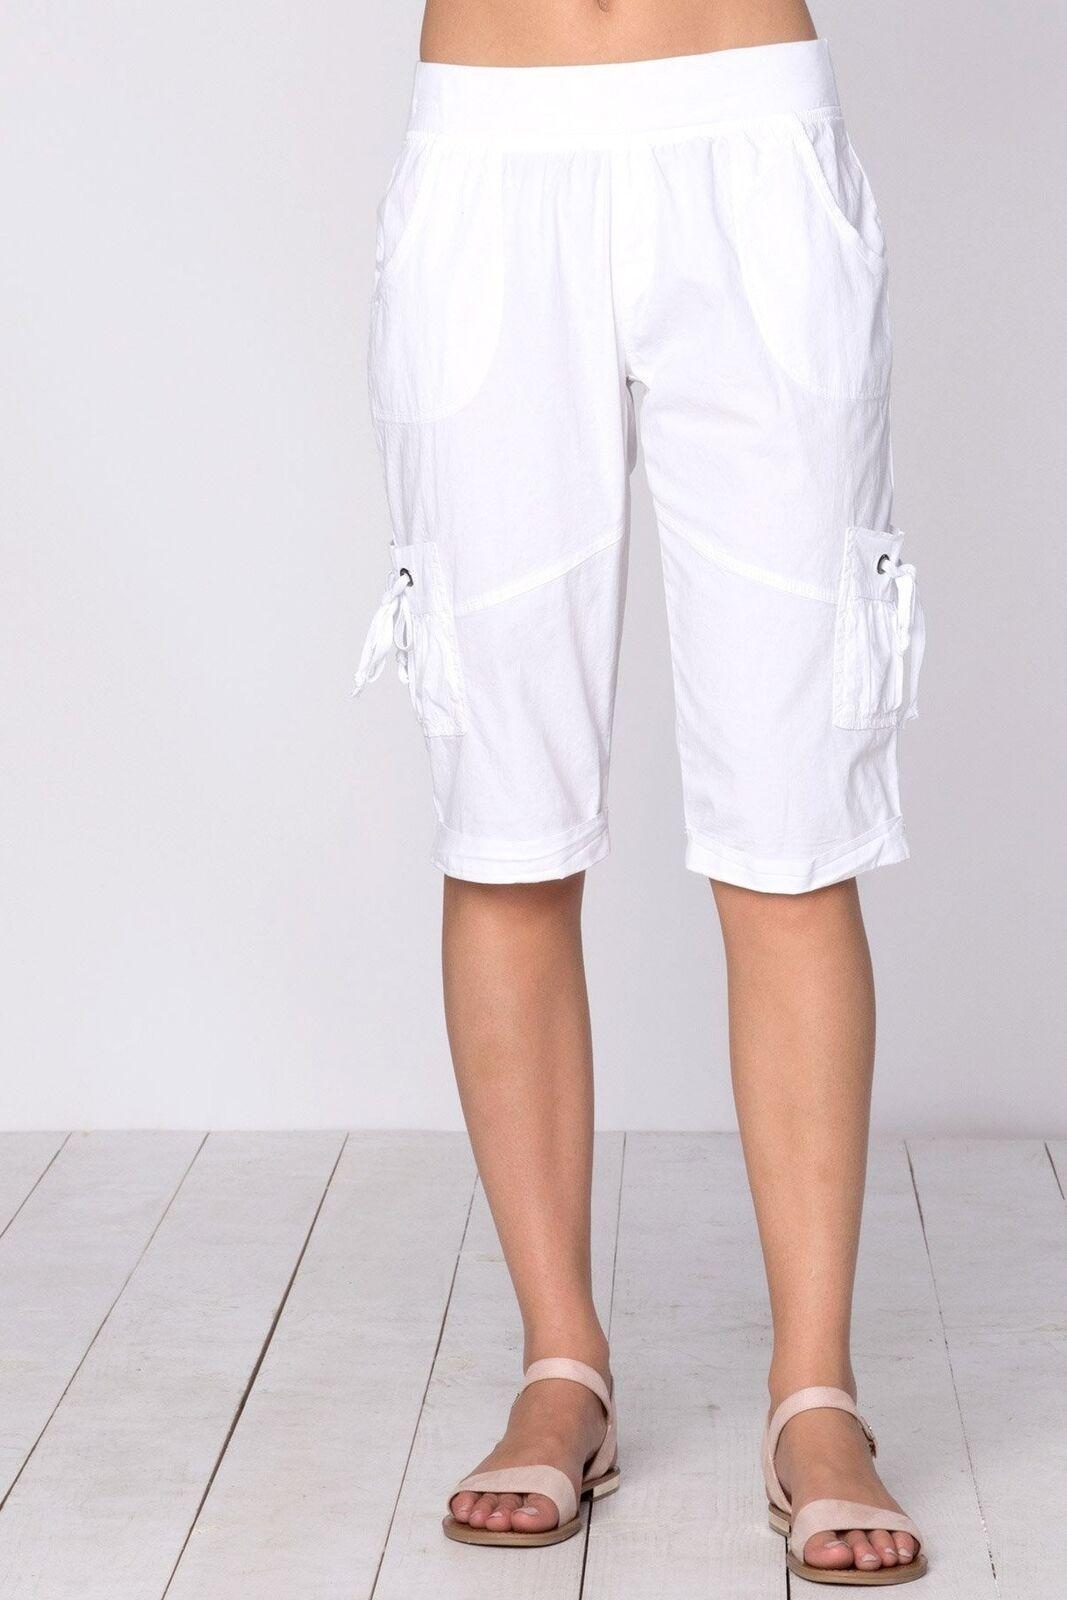 XCVI 148280 Women's Rylee Short color White Sz S